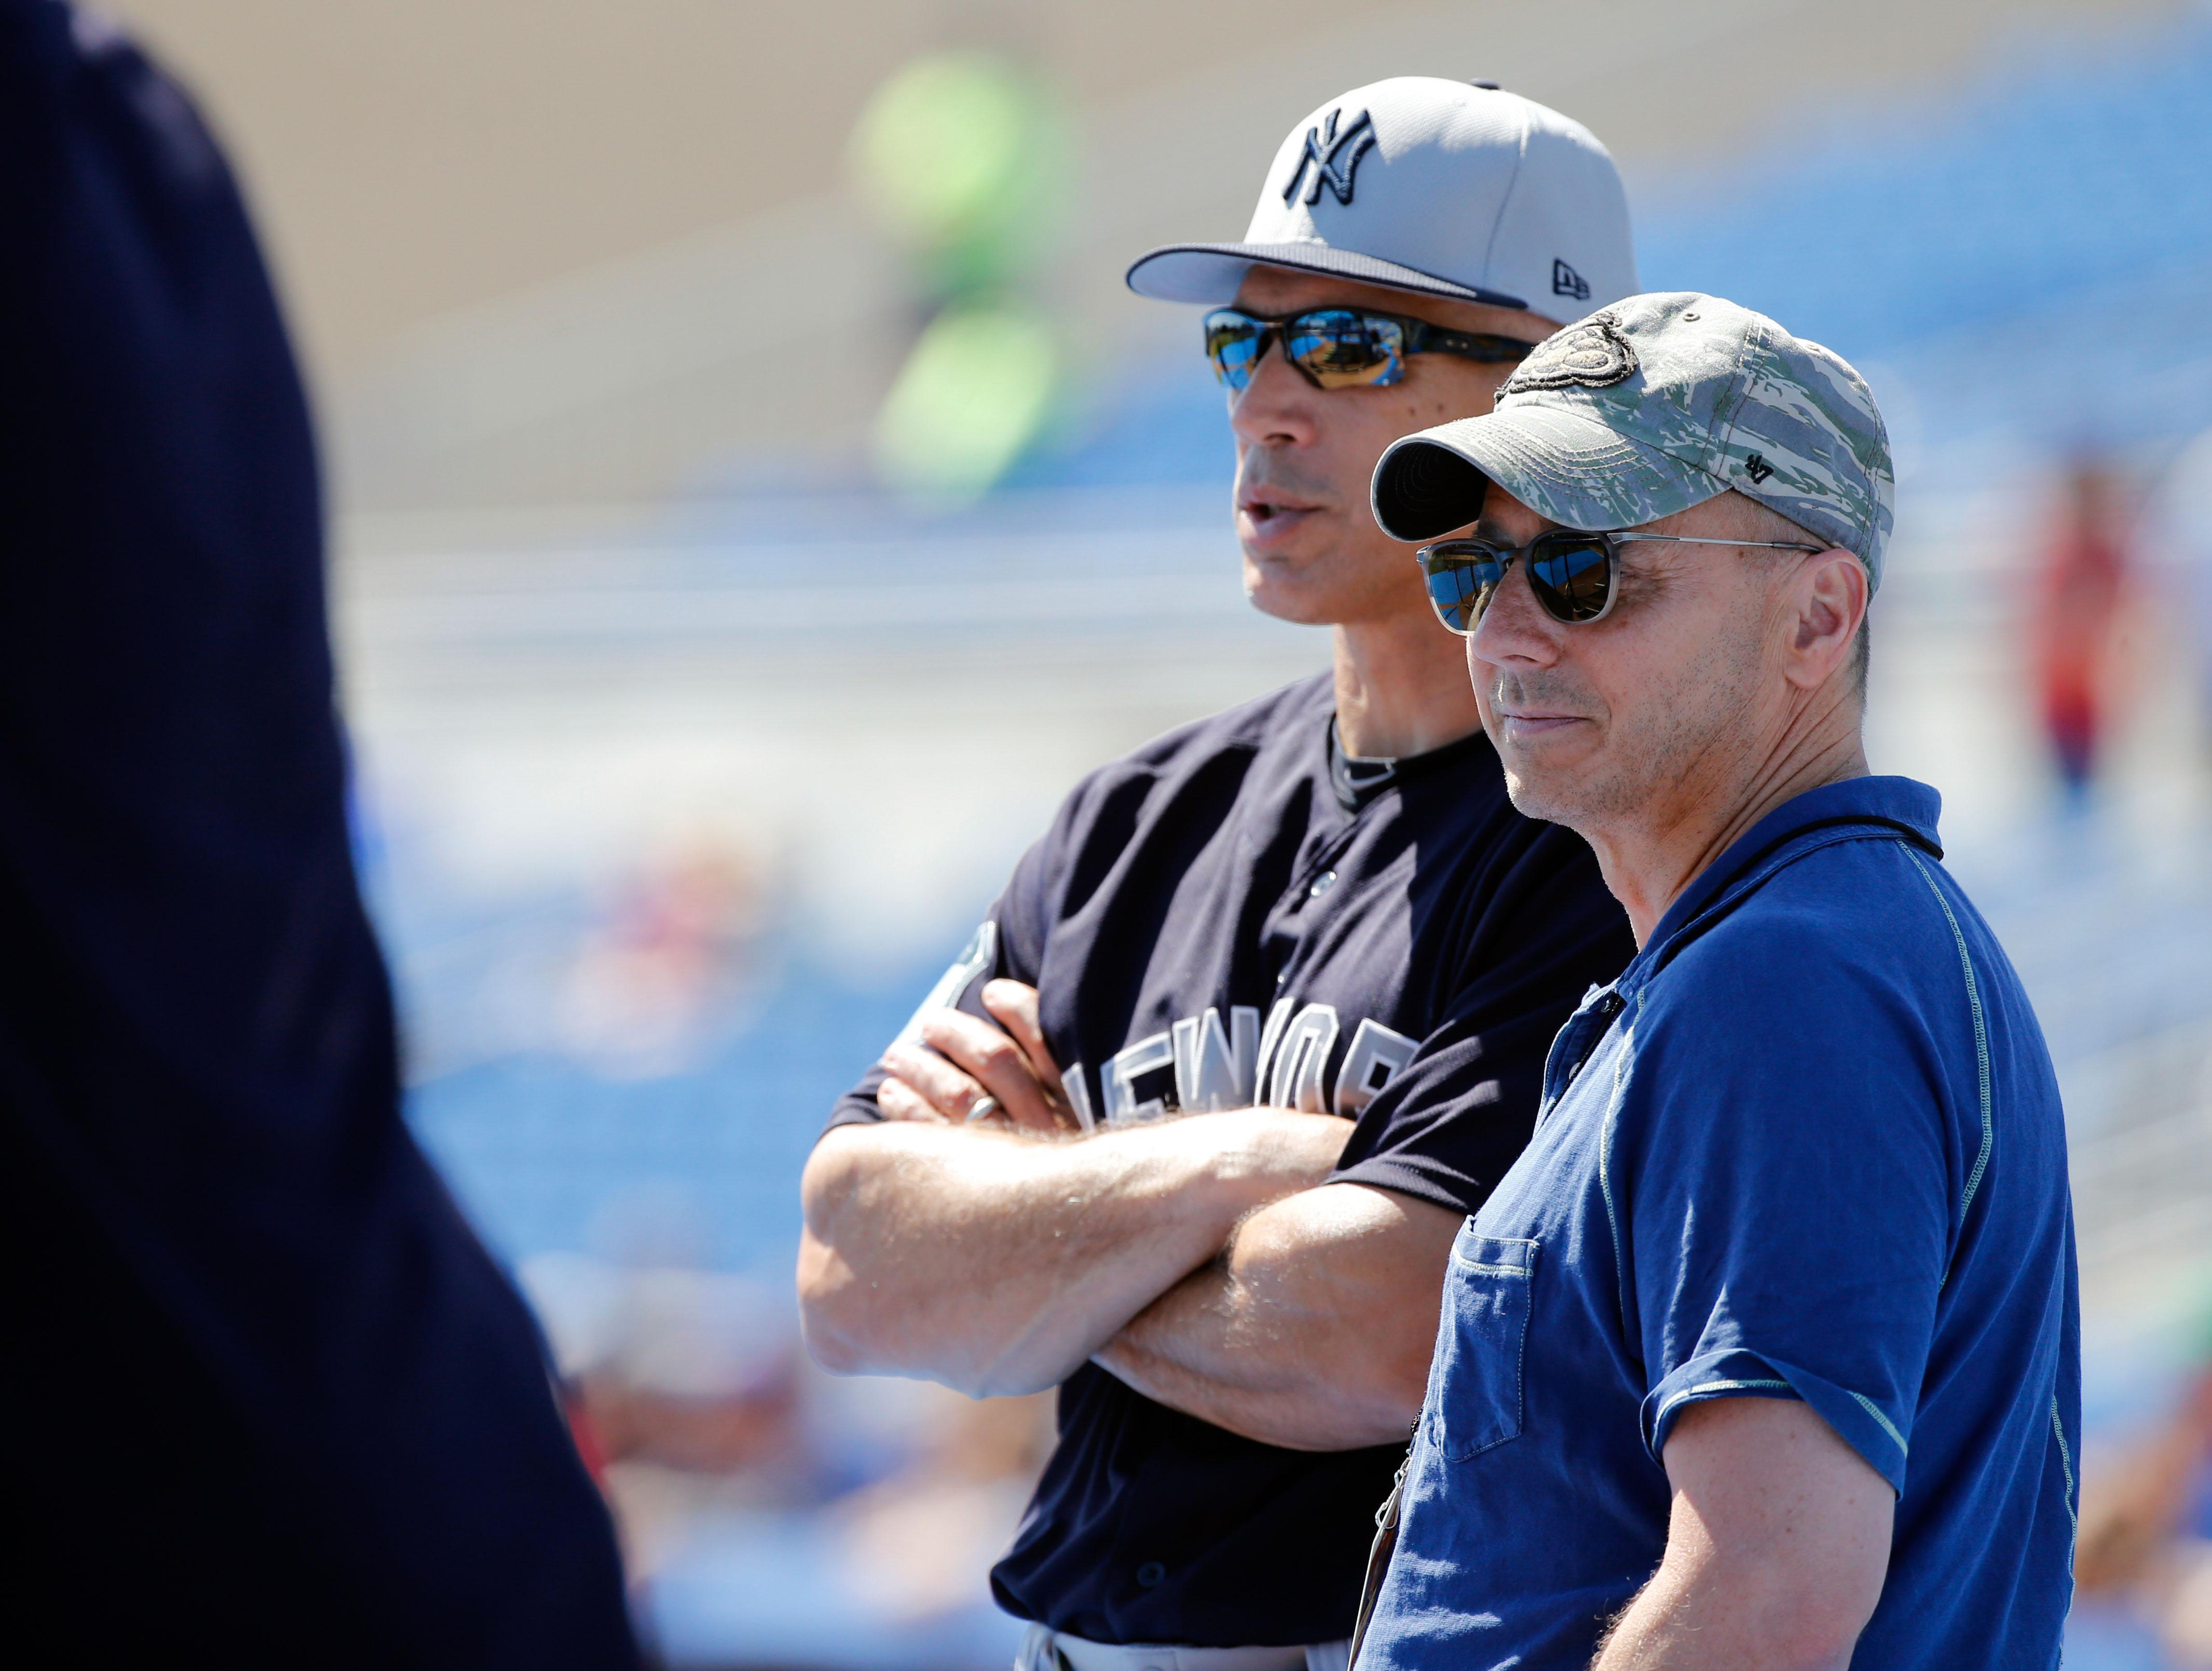 MLB: Spring Training-New York Yankees at Toronto Blue Jays